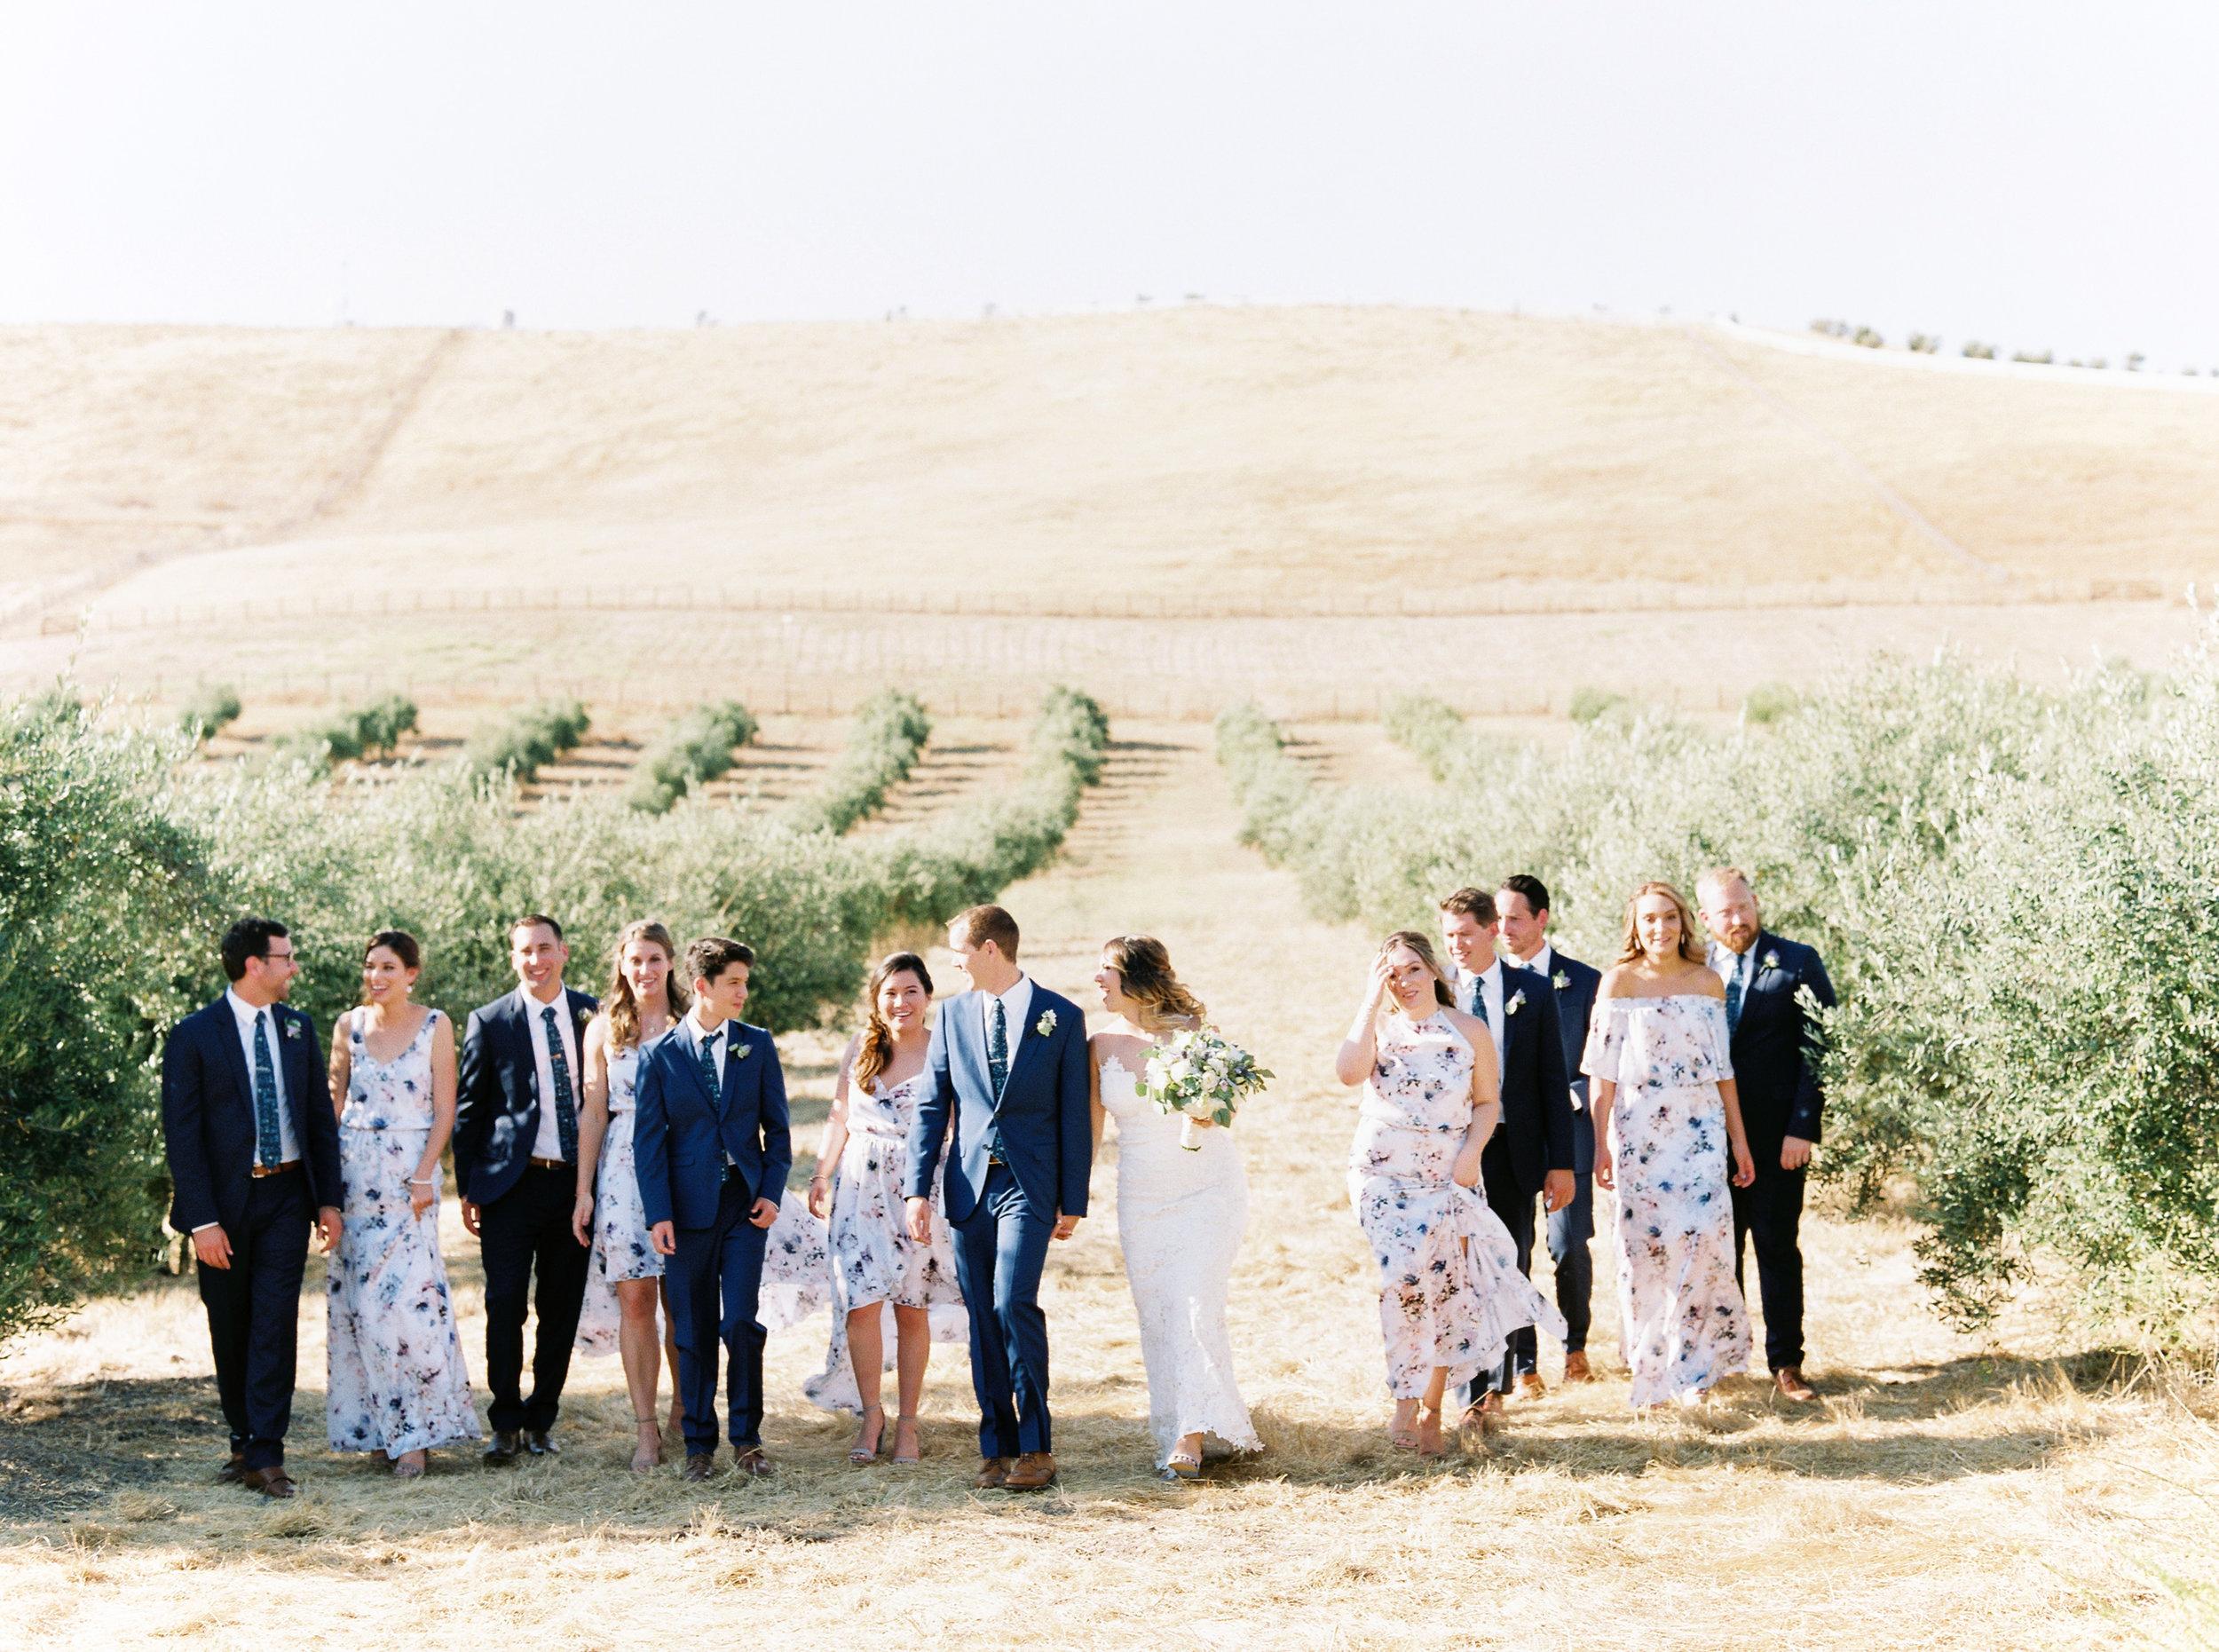 the-purple-orchid-resort-wedding-in-livermore-california-101.jpg